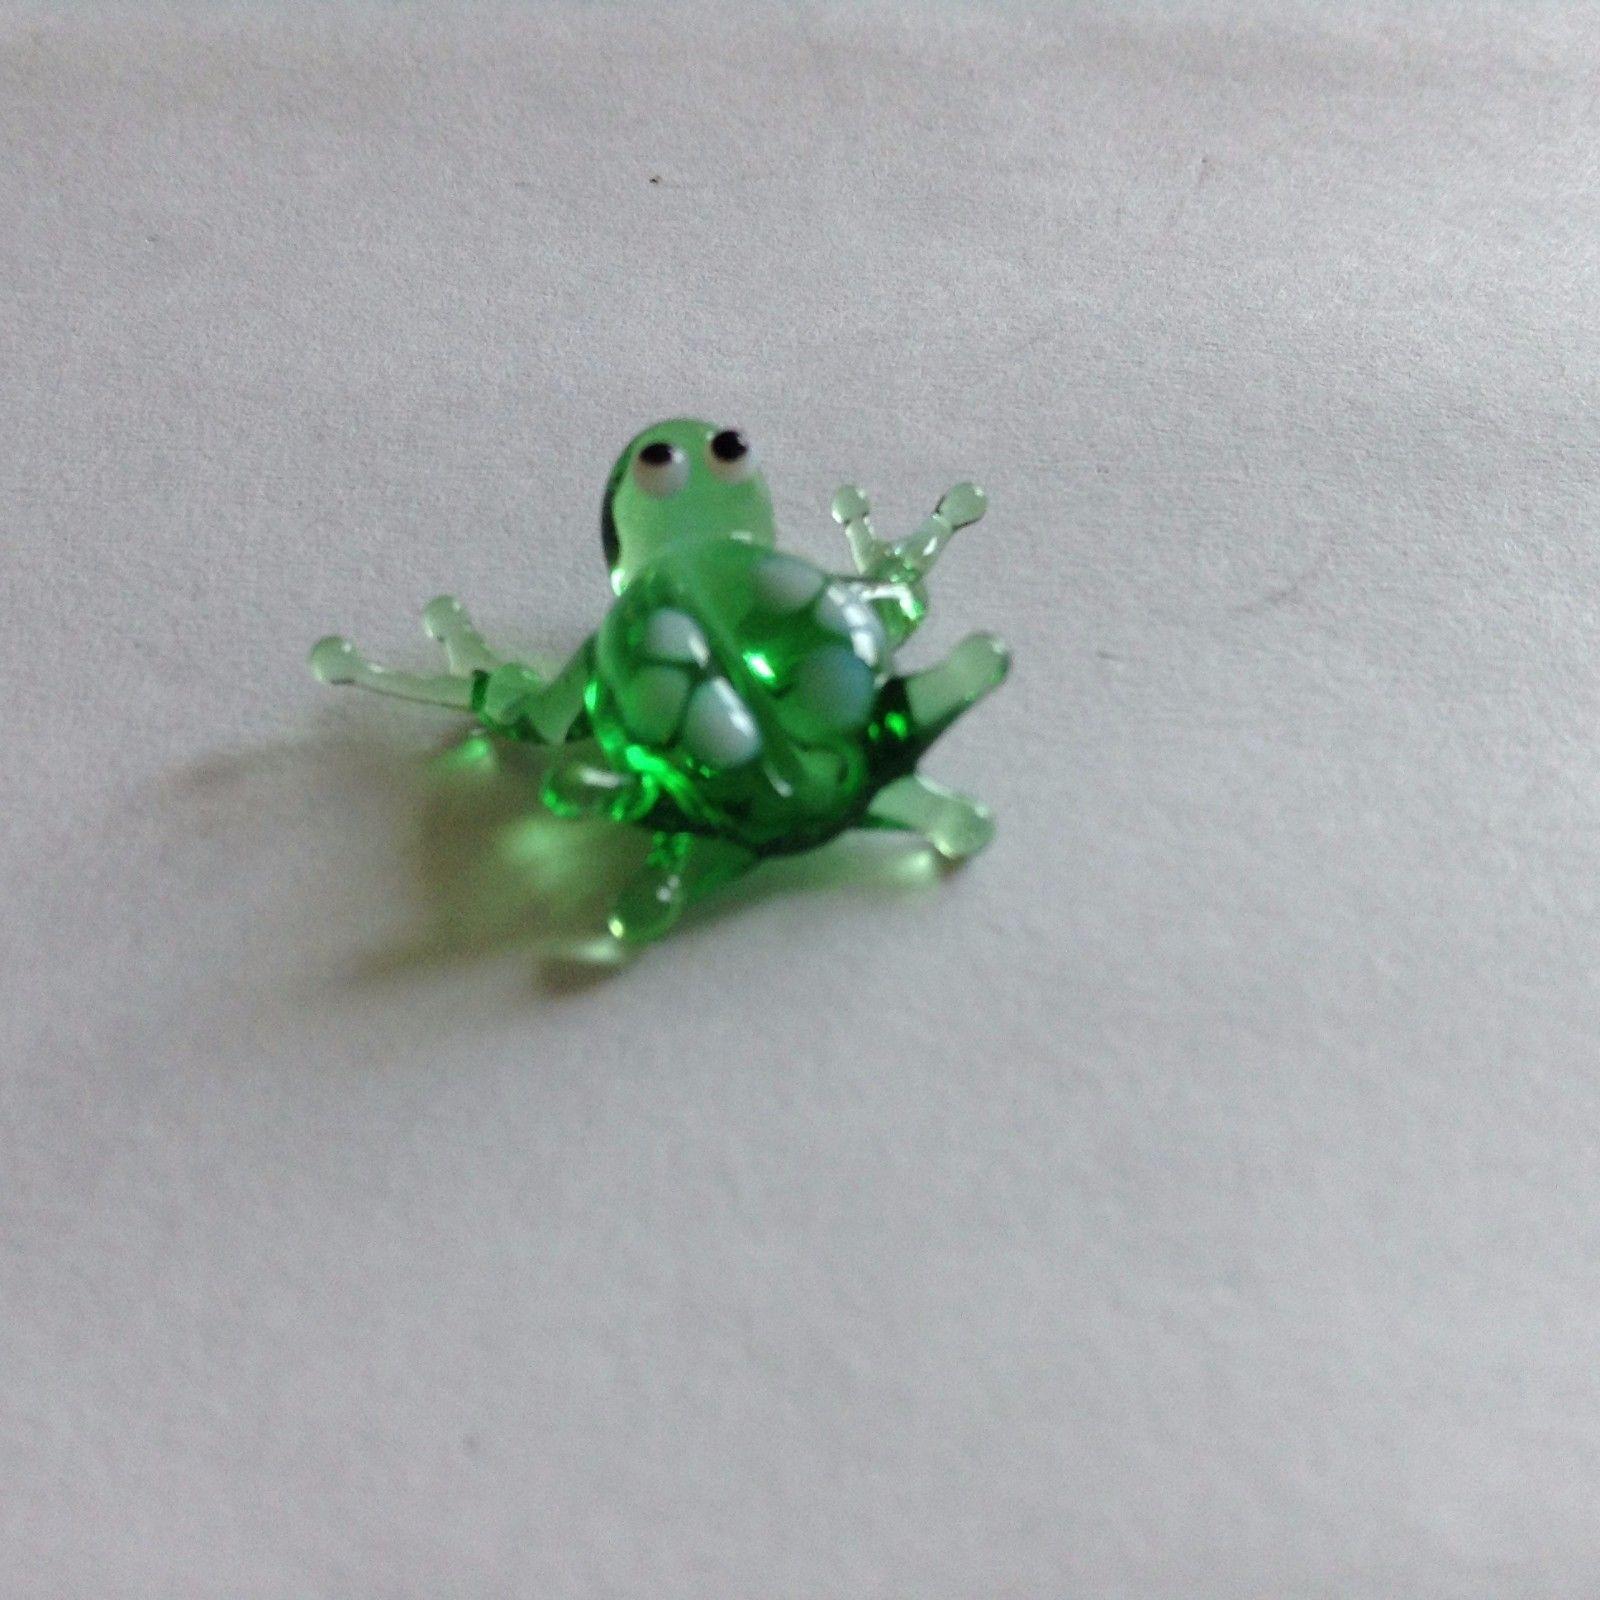 Micro miniature small hand blown glass figurine green frog white spots  USA  NIB